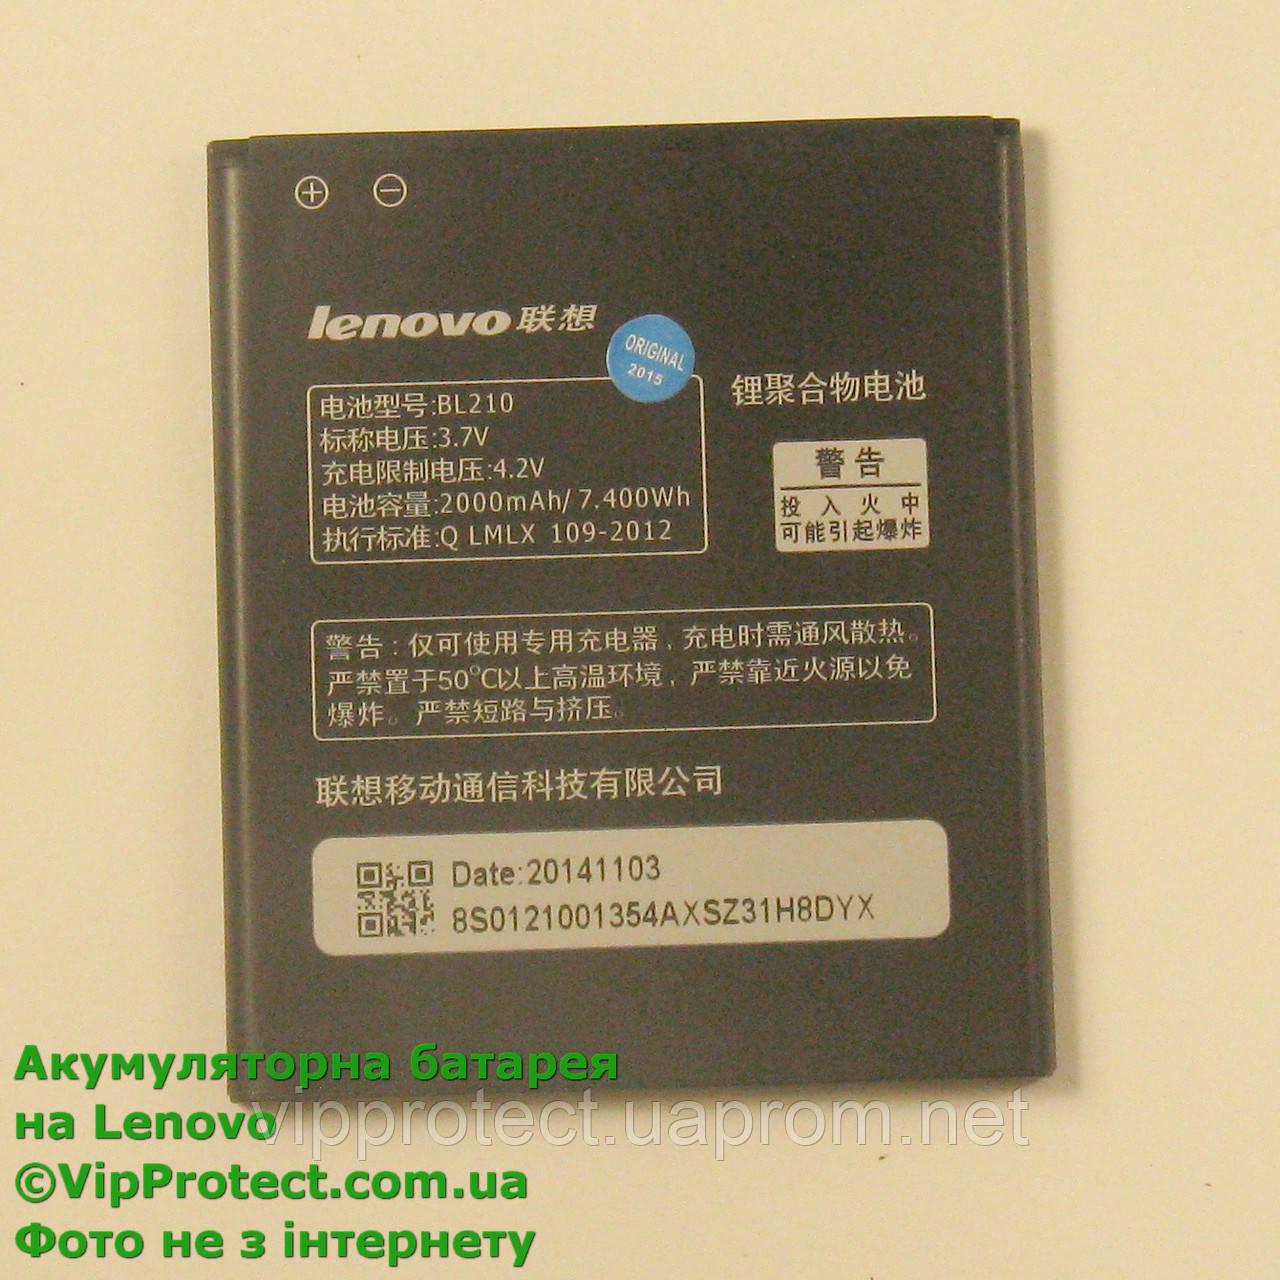 Lenovo A656 BL210 акумулятор 2000мА⋅год оригінальний